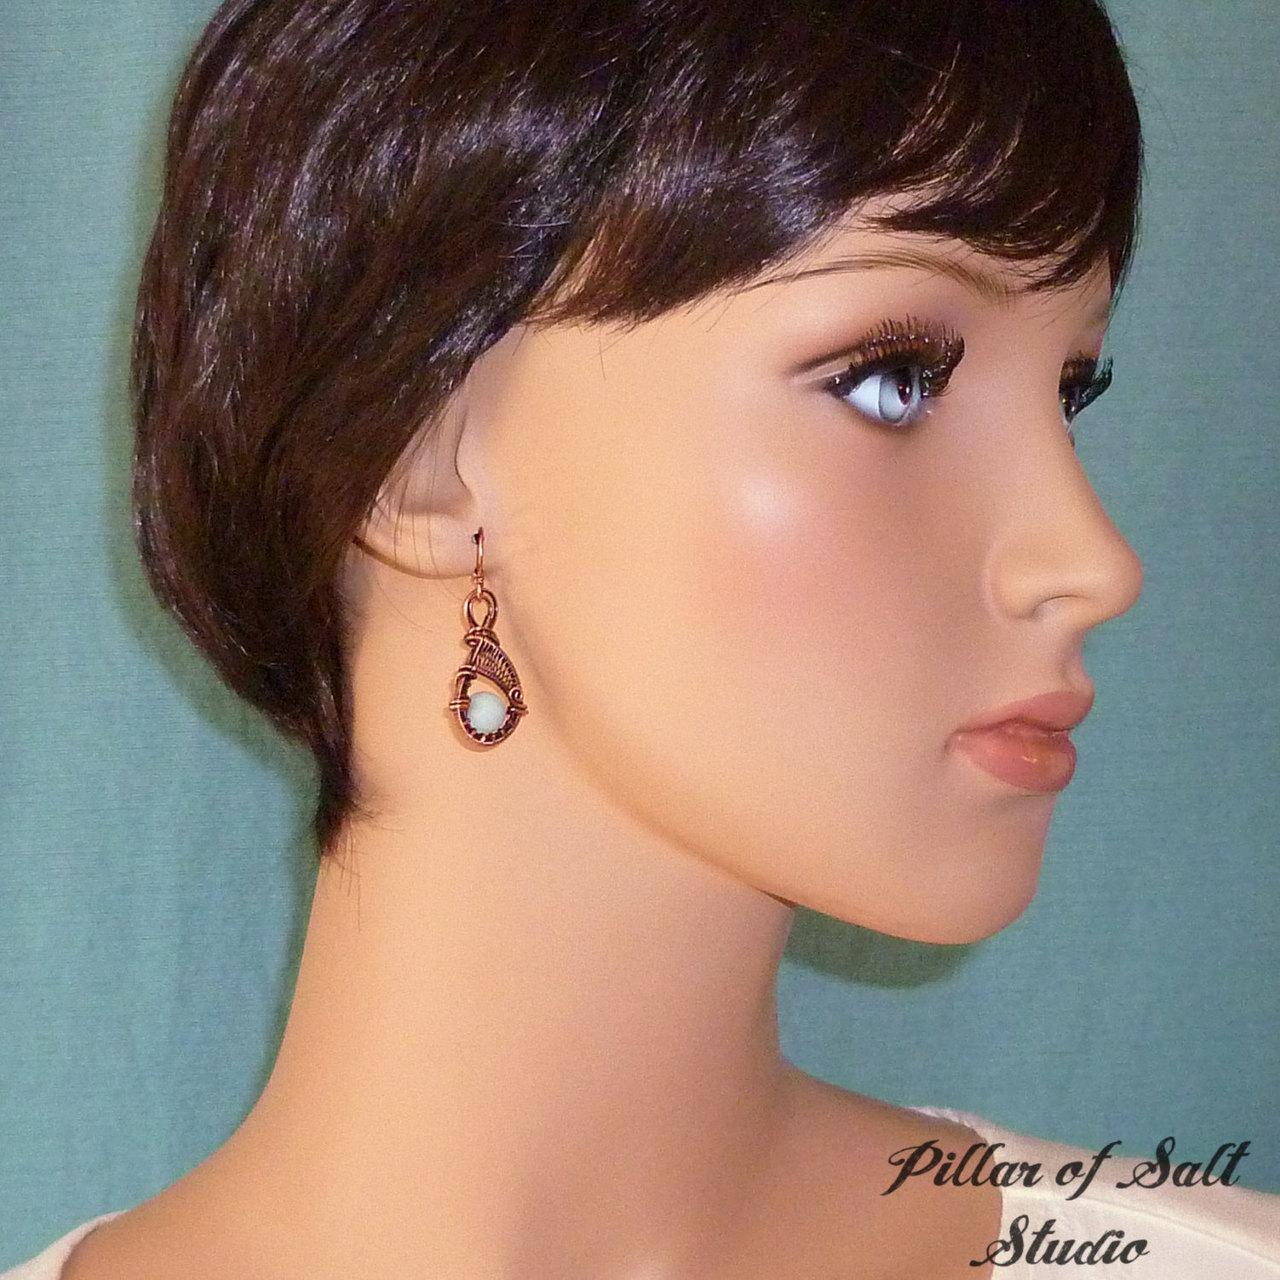 woven wire earrings with Amazonite gemstones by Pillar of Salt Studio